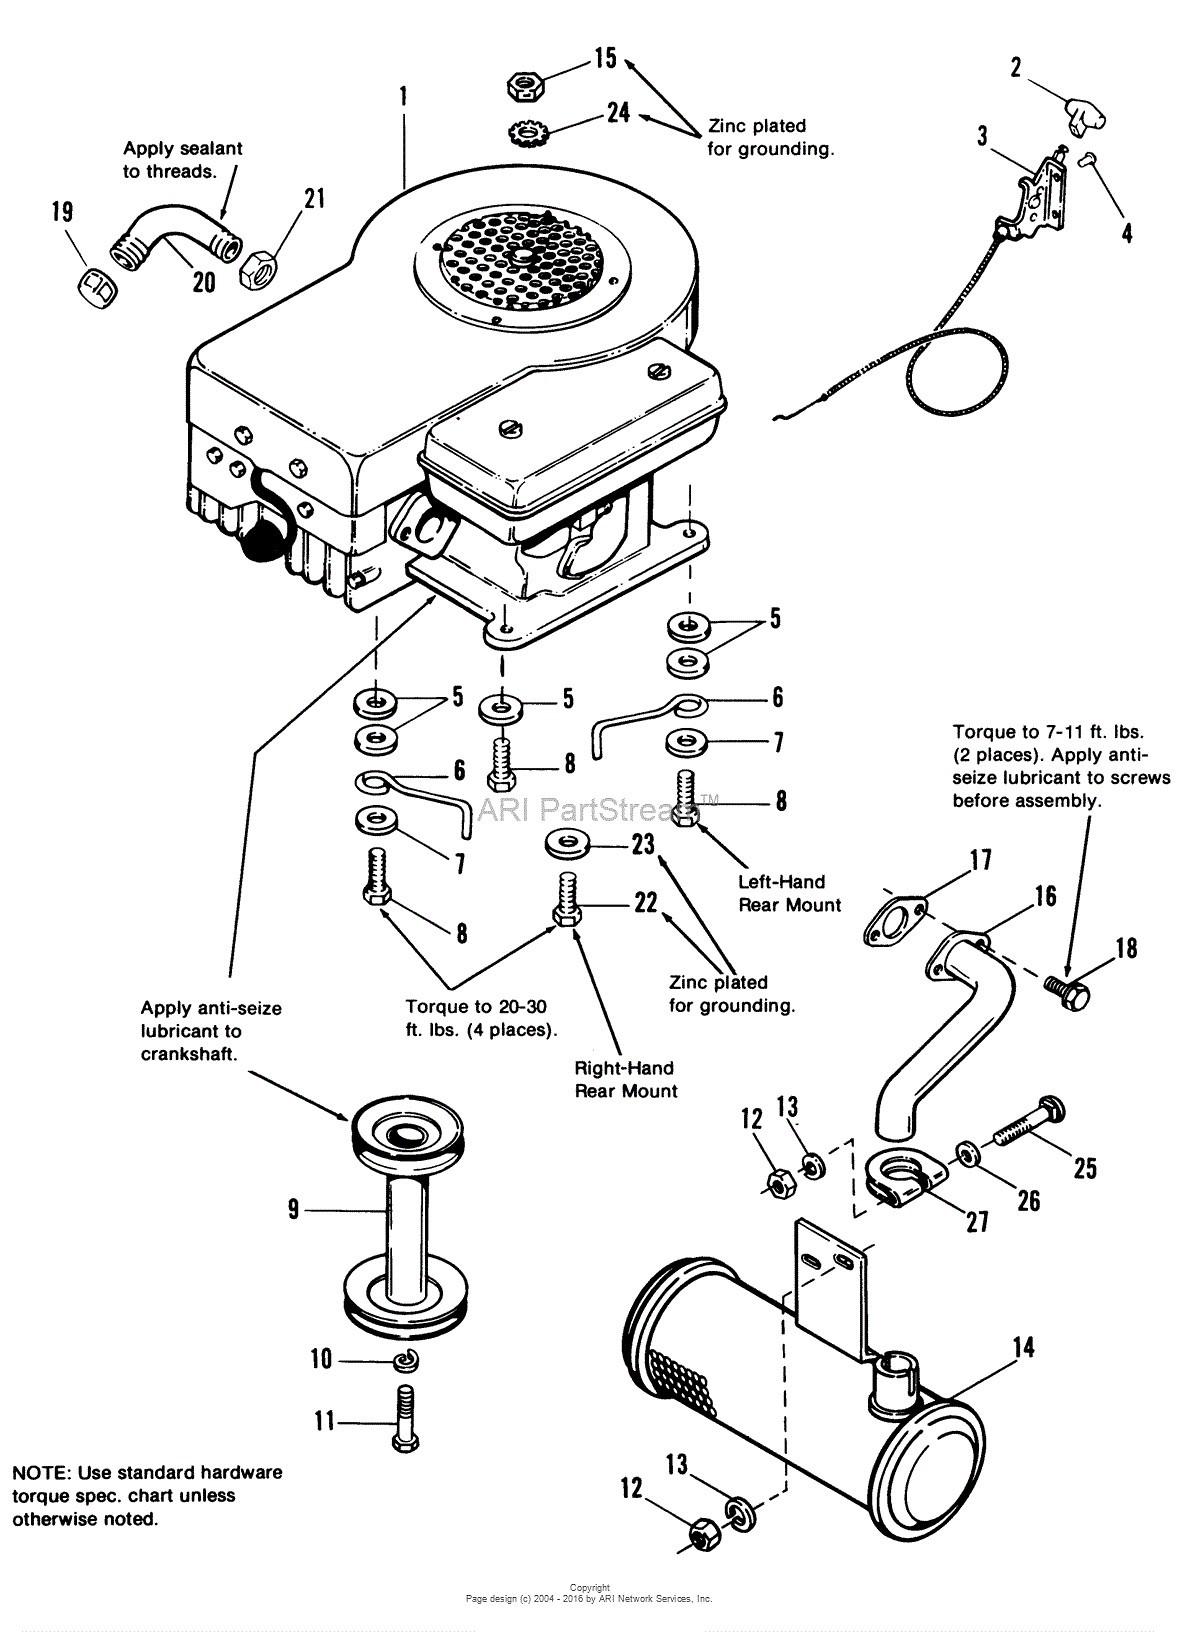 17.5 Briggs and Stratton Engine Part Diagram Briggs and Stratton 17 5 Hp Engine Diagram